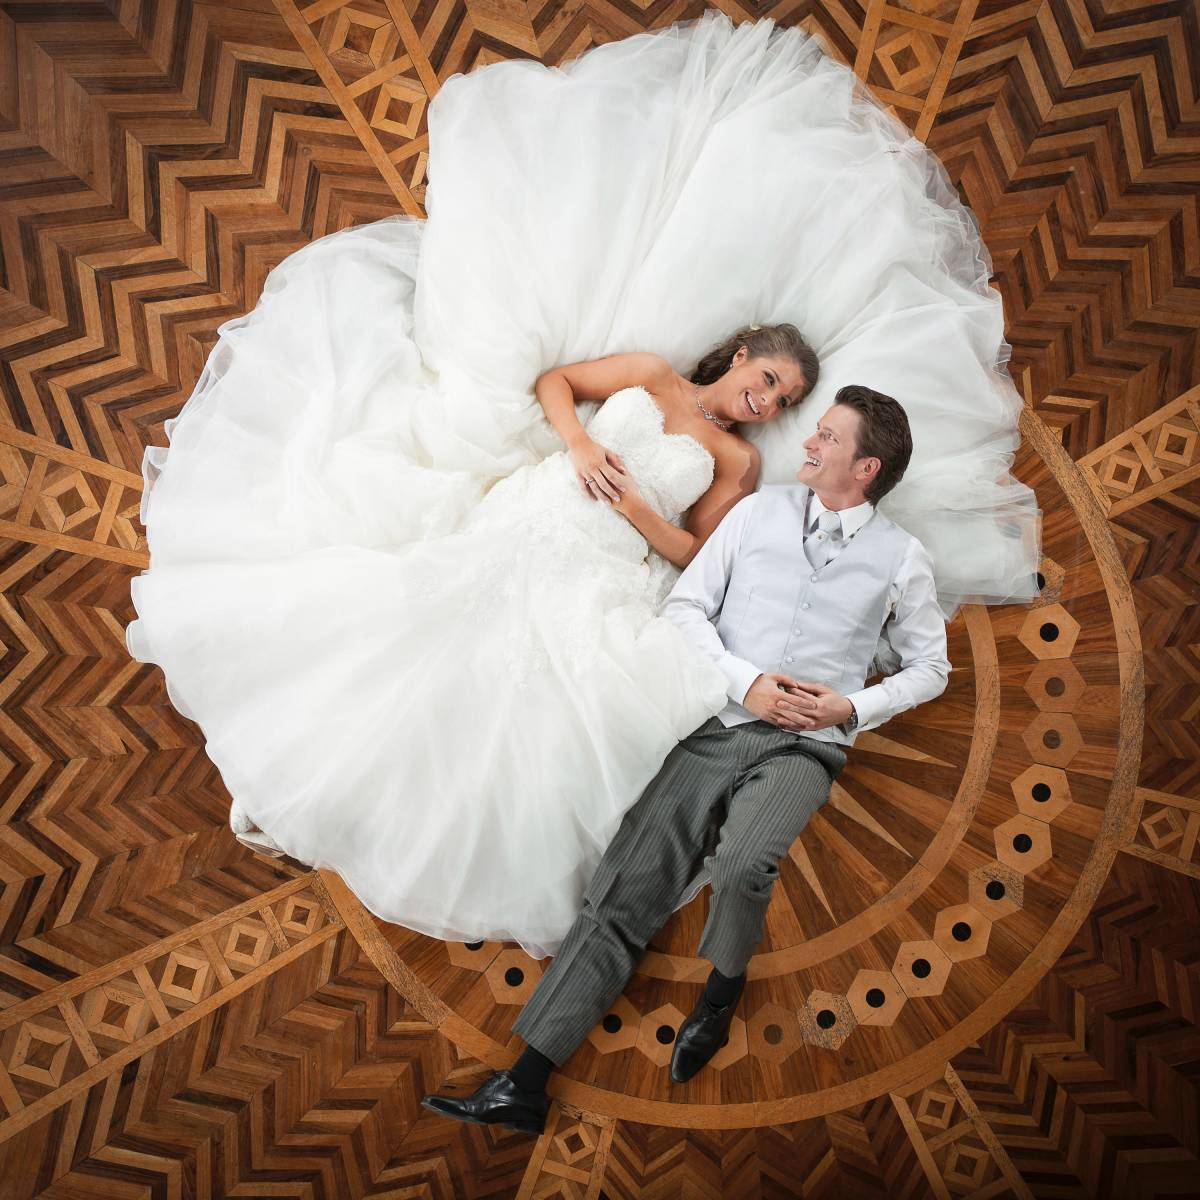 Foto Meeuw - House of Weddings - 6